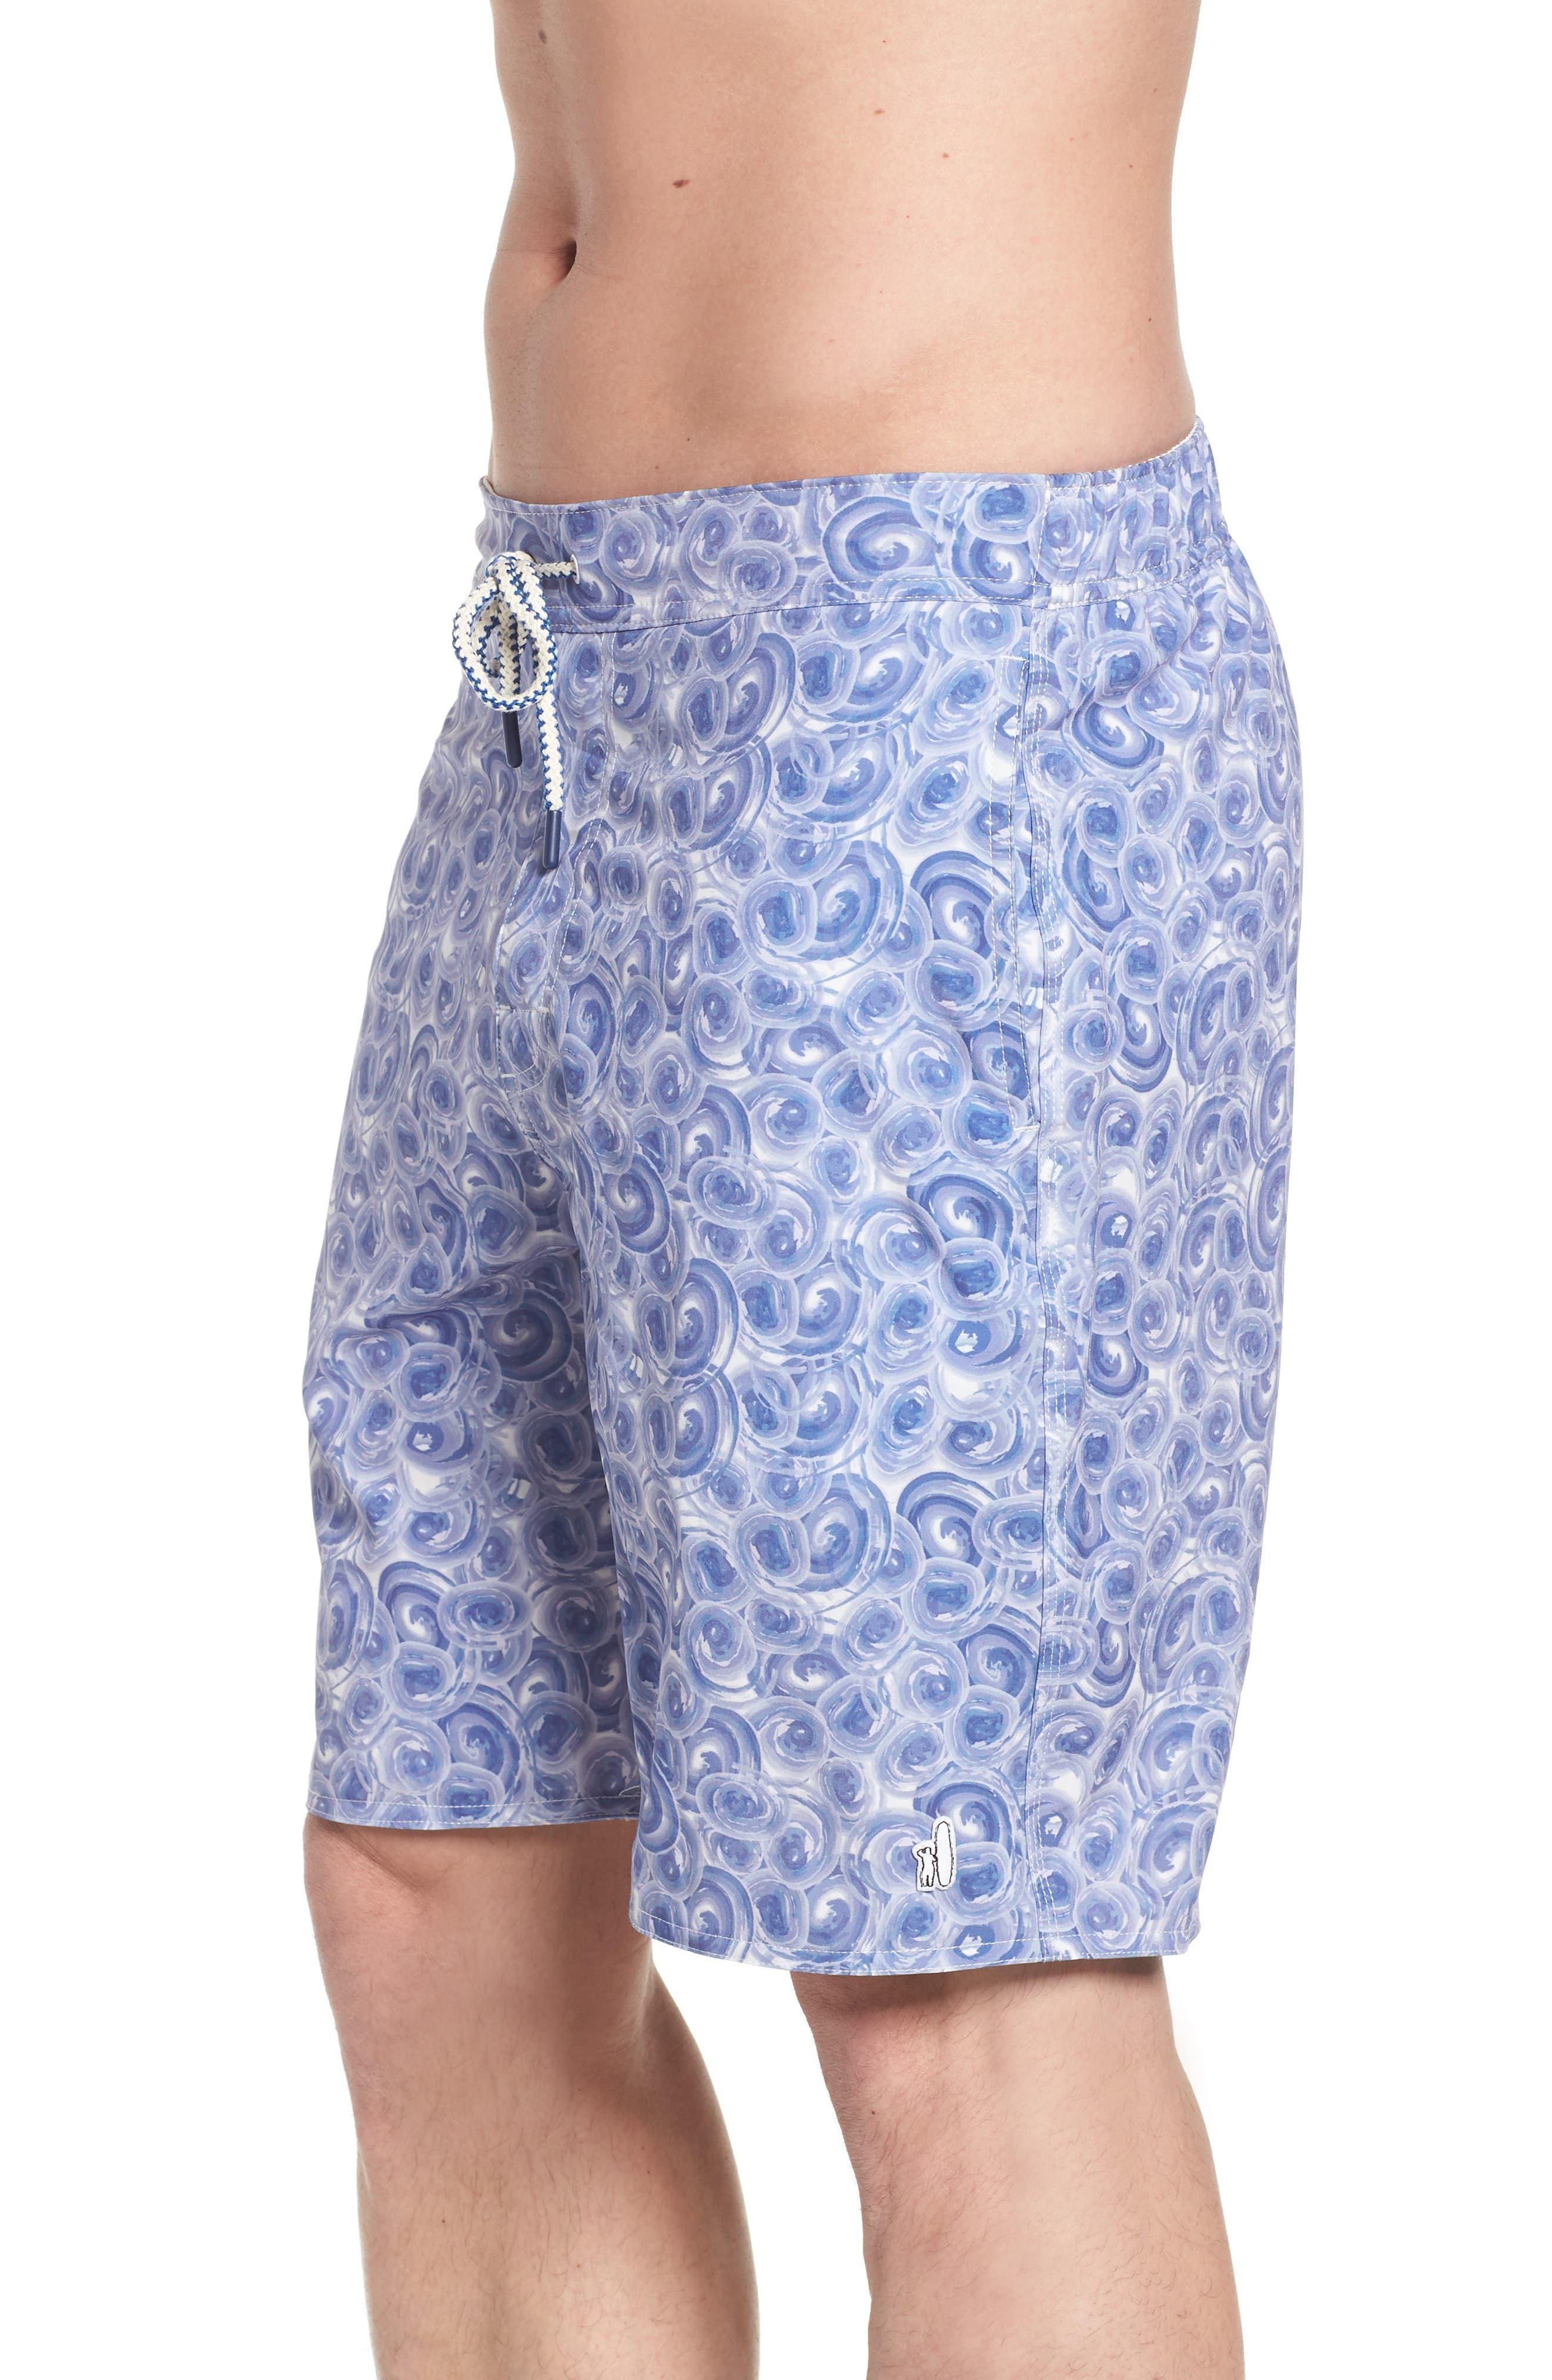 High Tide Regular Fit Board Shorts,                             Alternate thumbnail 3, color,                             400